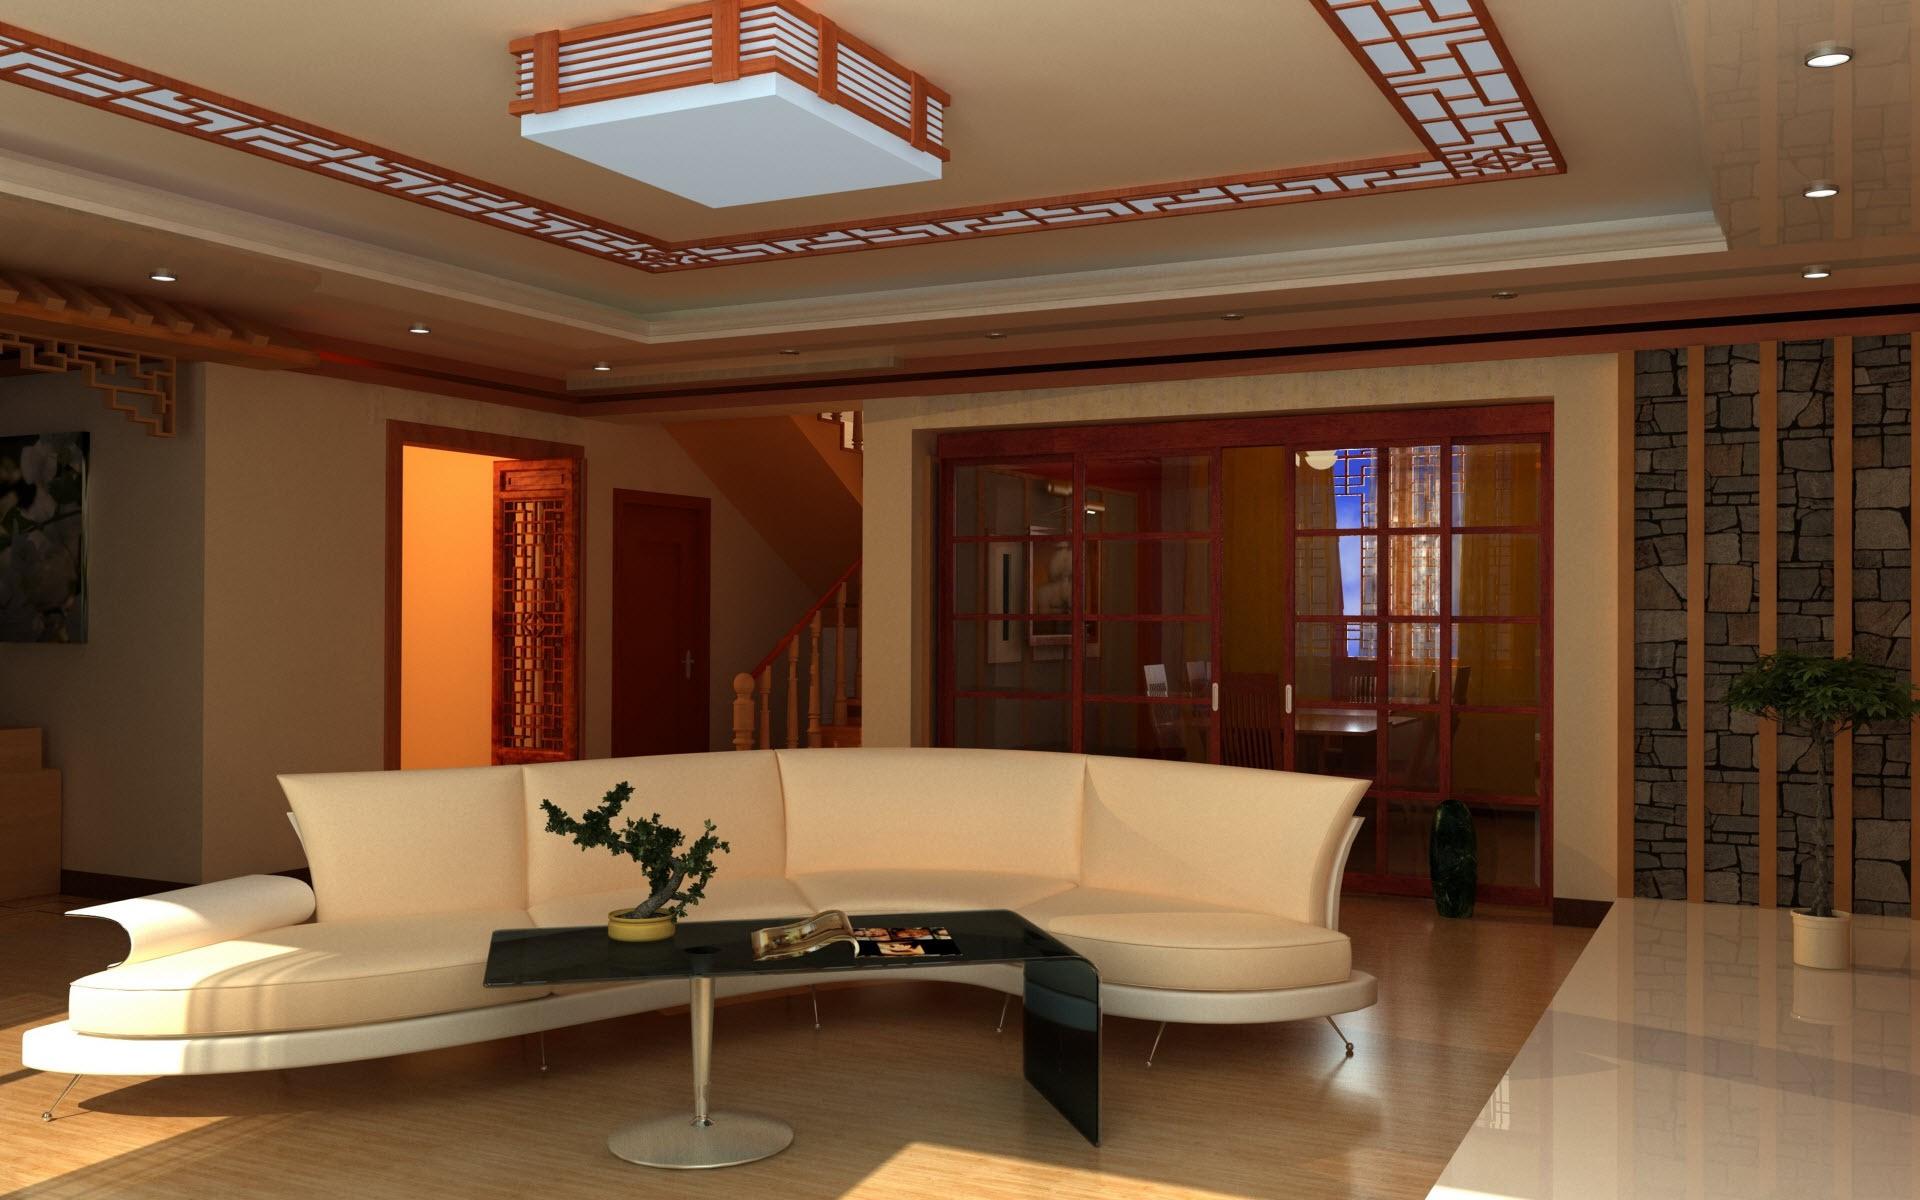 Una sala elegante - 1920x1200